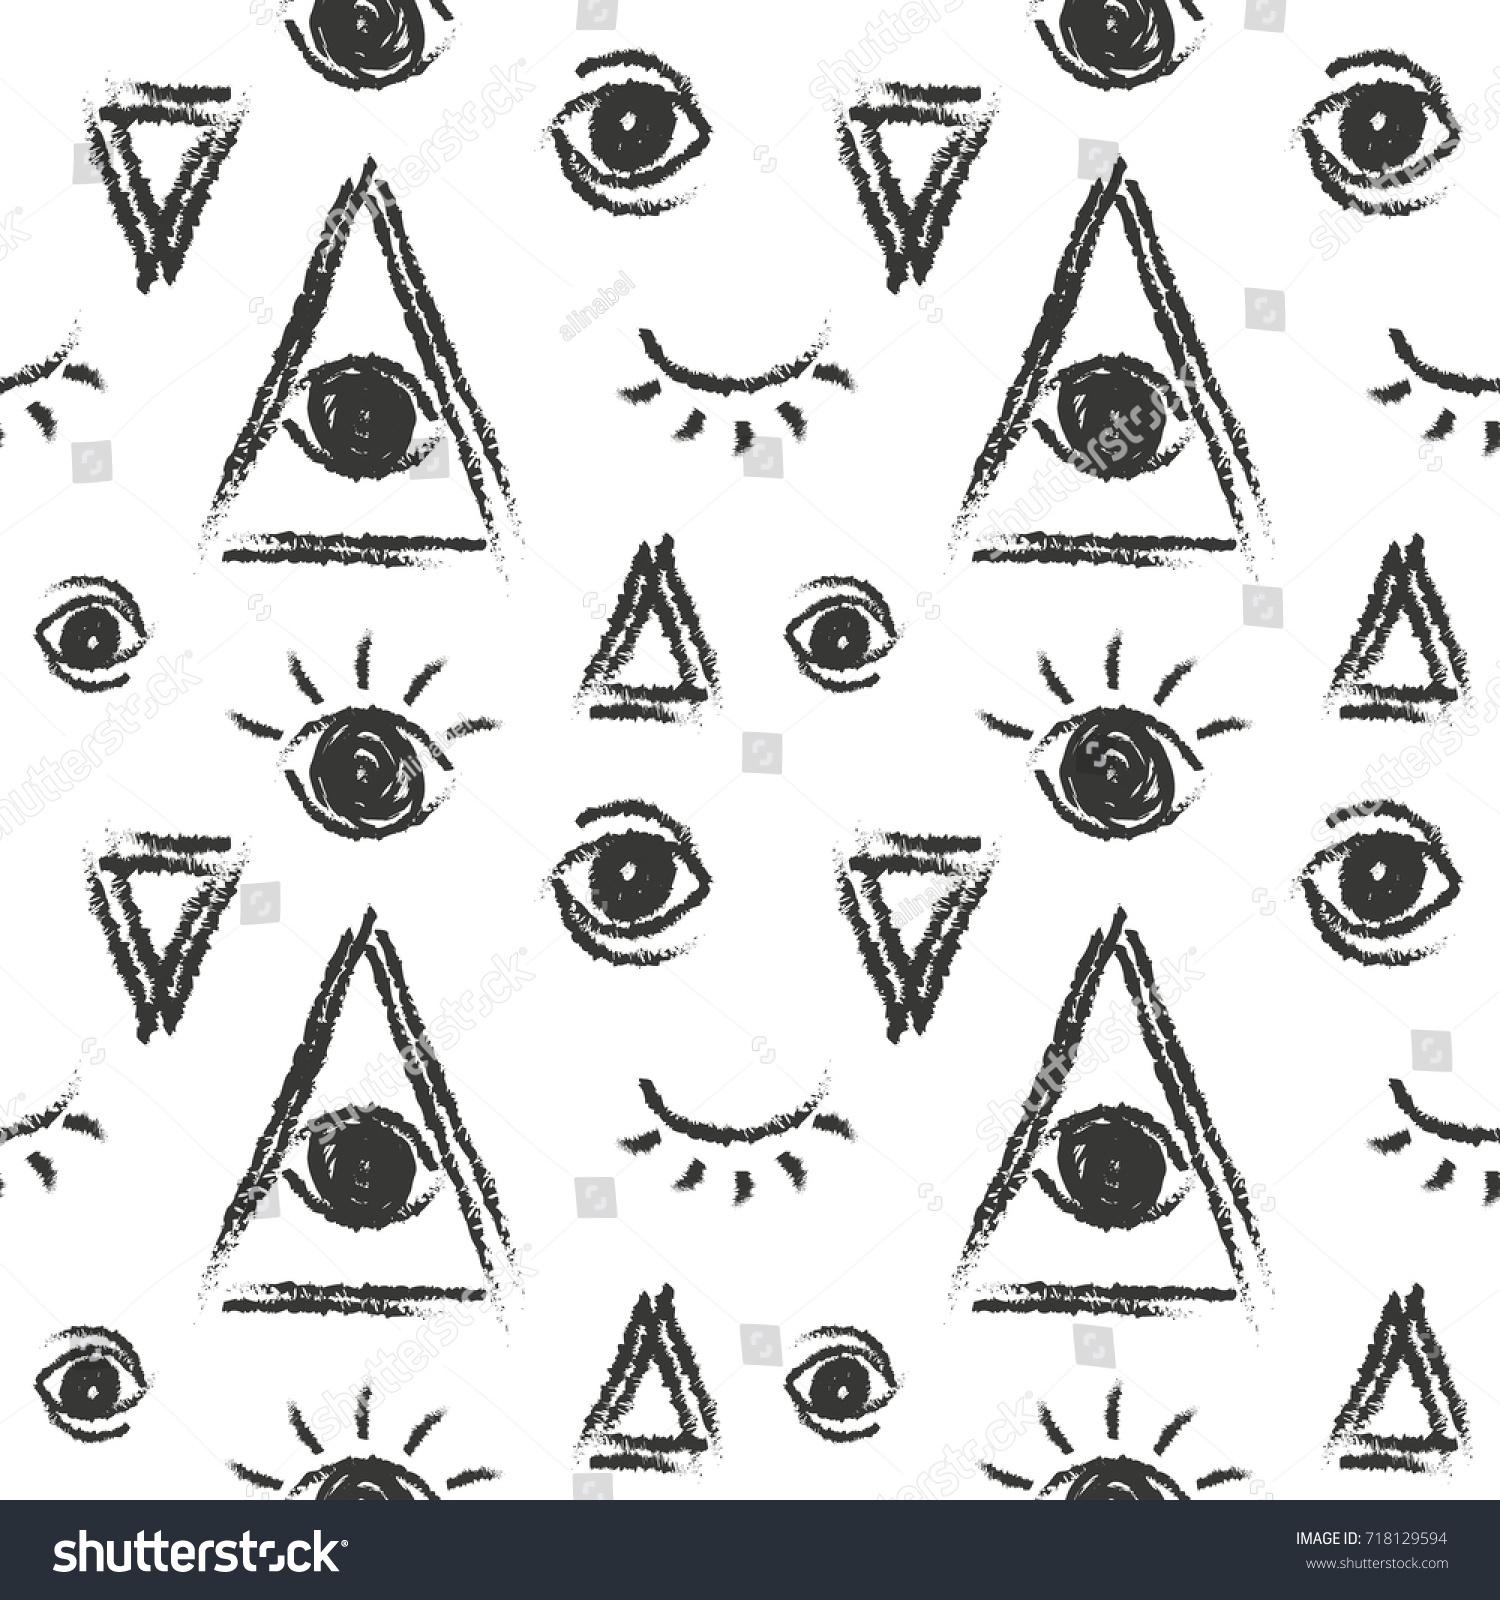 Vector seamless pattern eye providence masonic stock vector vector seamless pattern with eye of providence masonic symbol buycottarizona Images